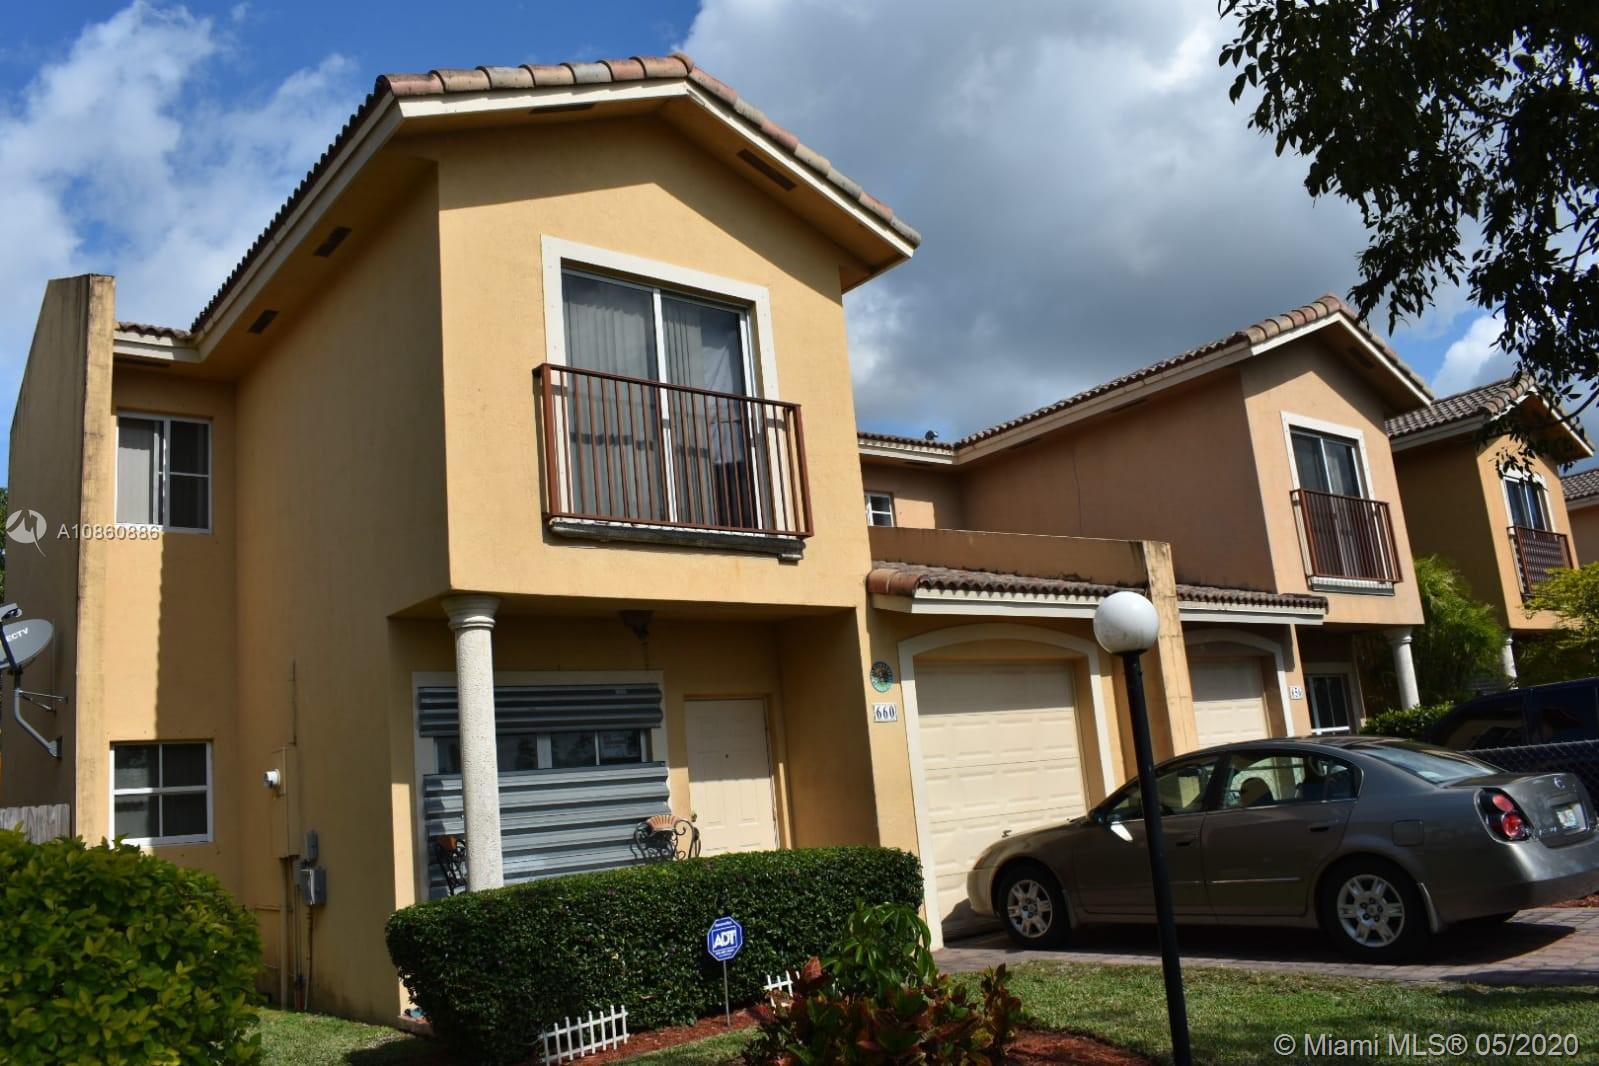 661 SW 10th St #1, Florida City, FL 33034 - Florida City, FL real estate listing